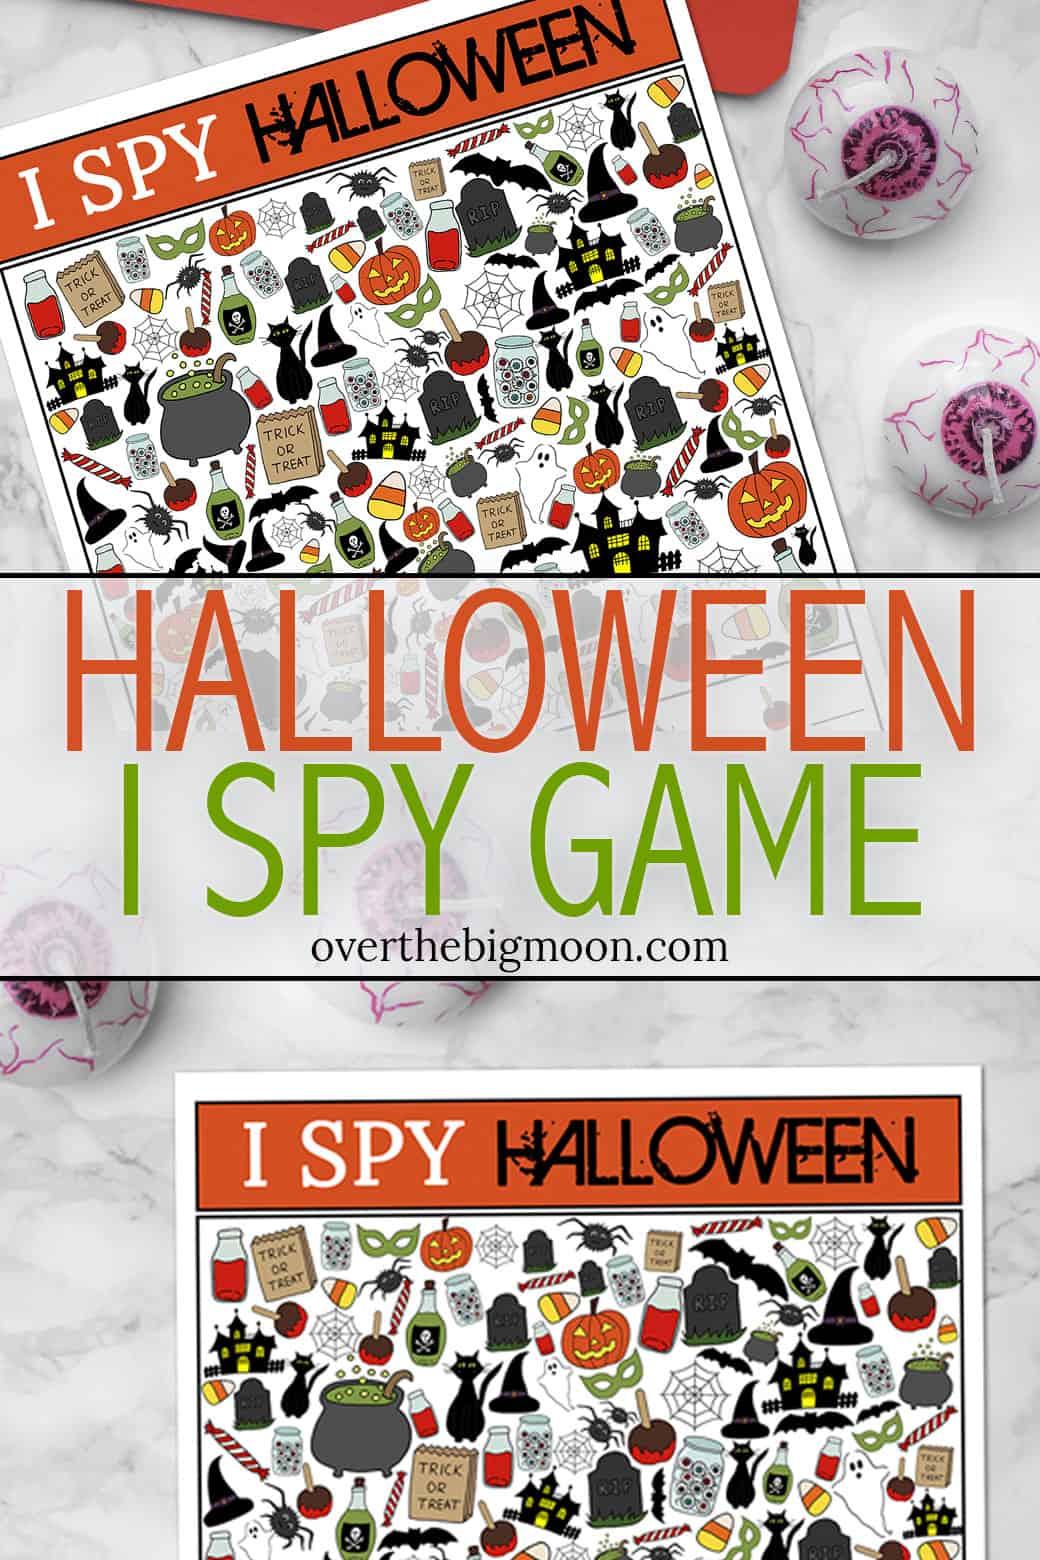 Halloween I Spy Game Printable for kids! From overthebigmoon.com!